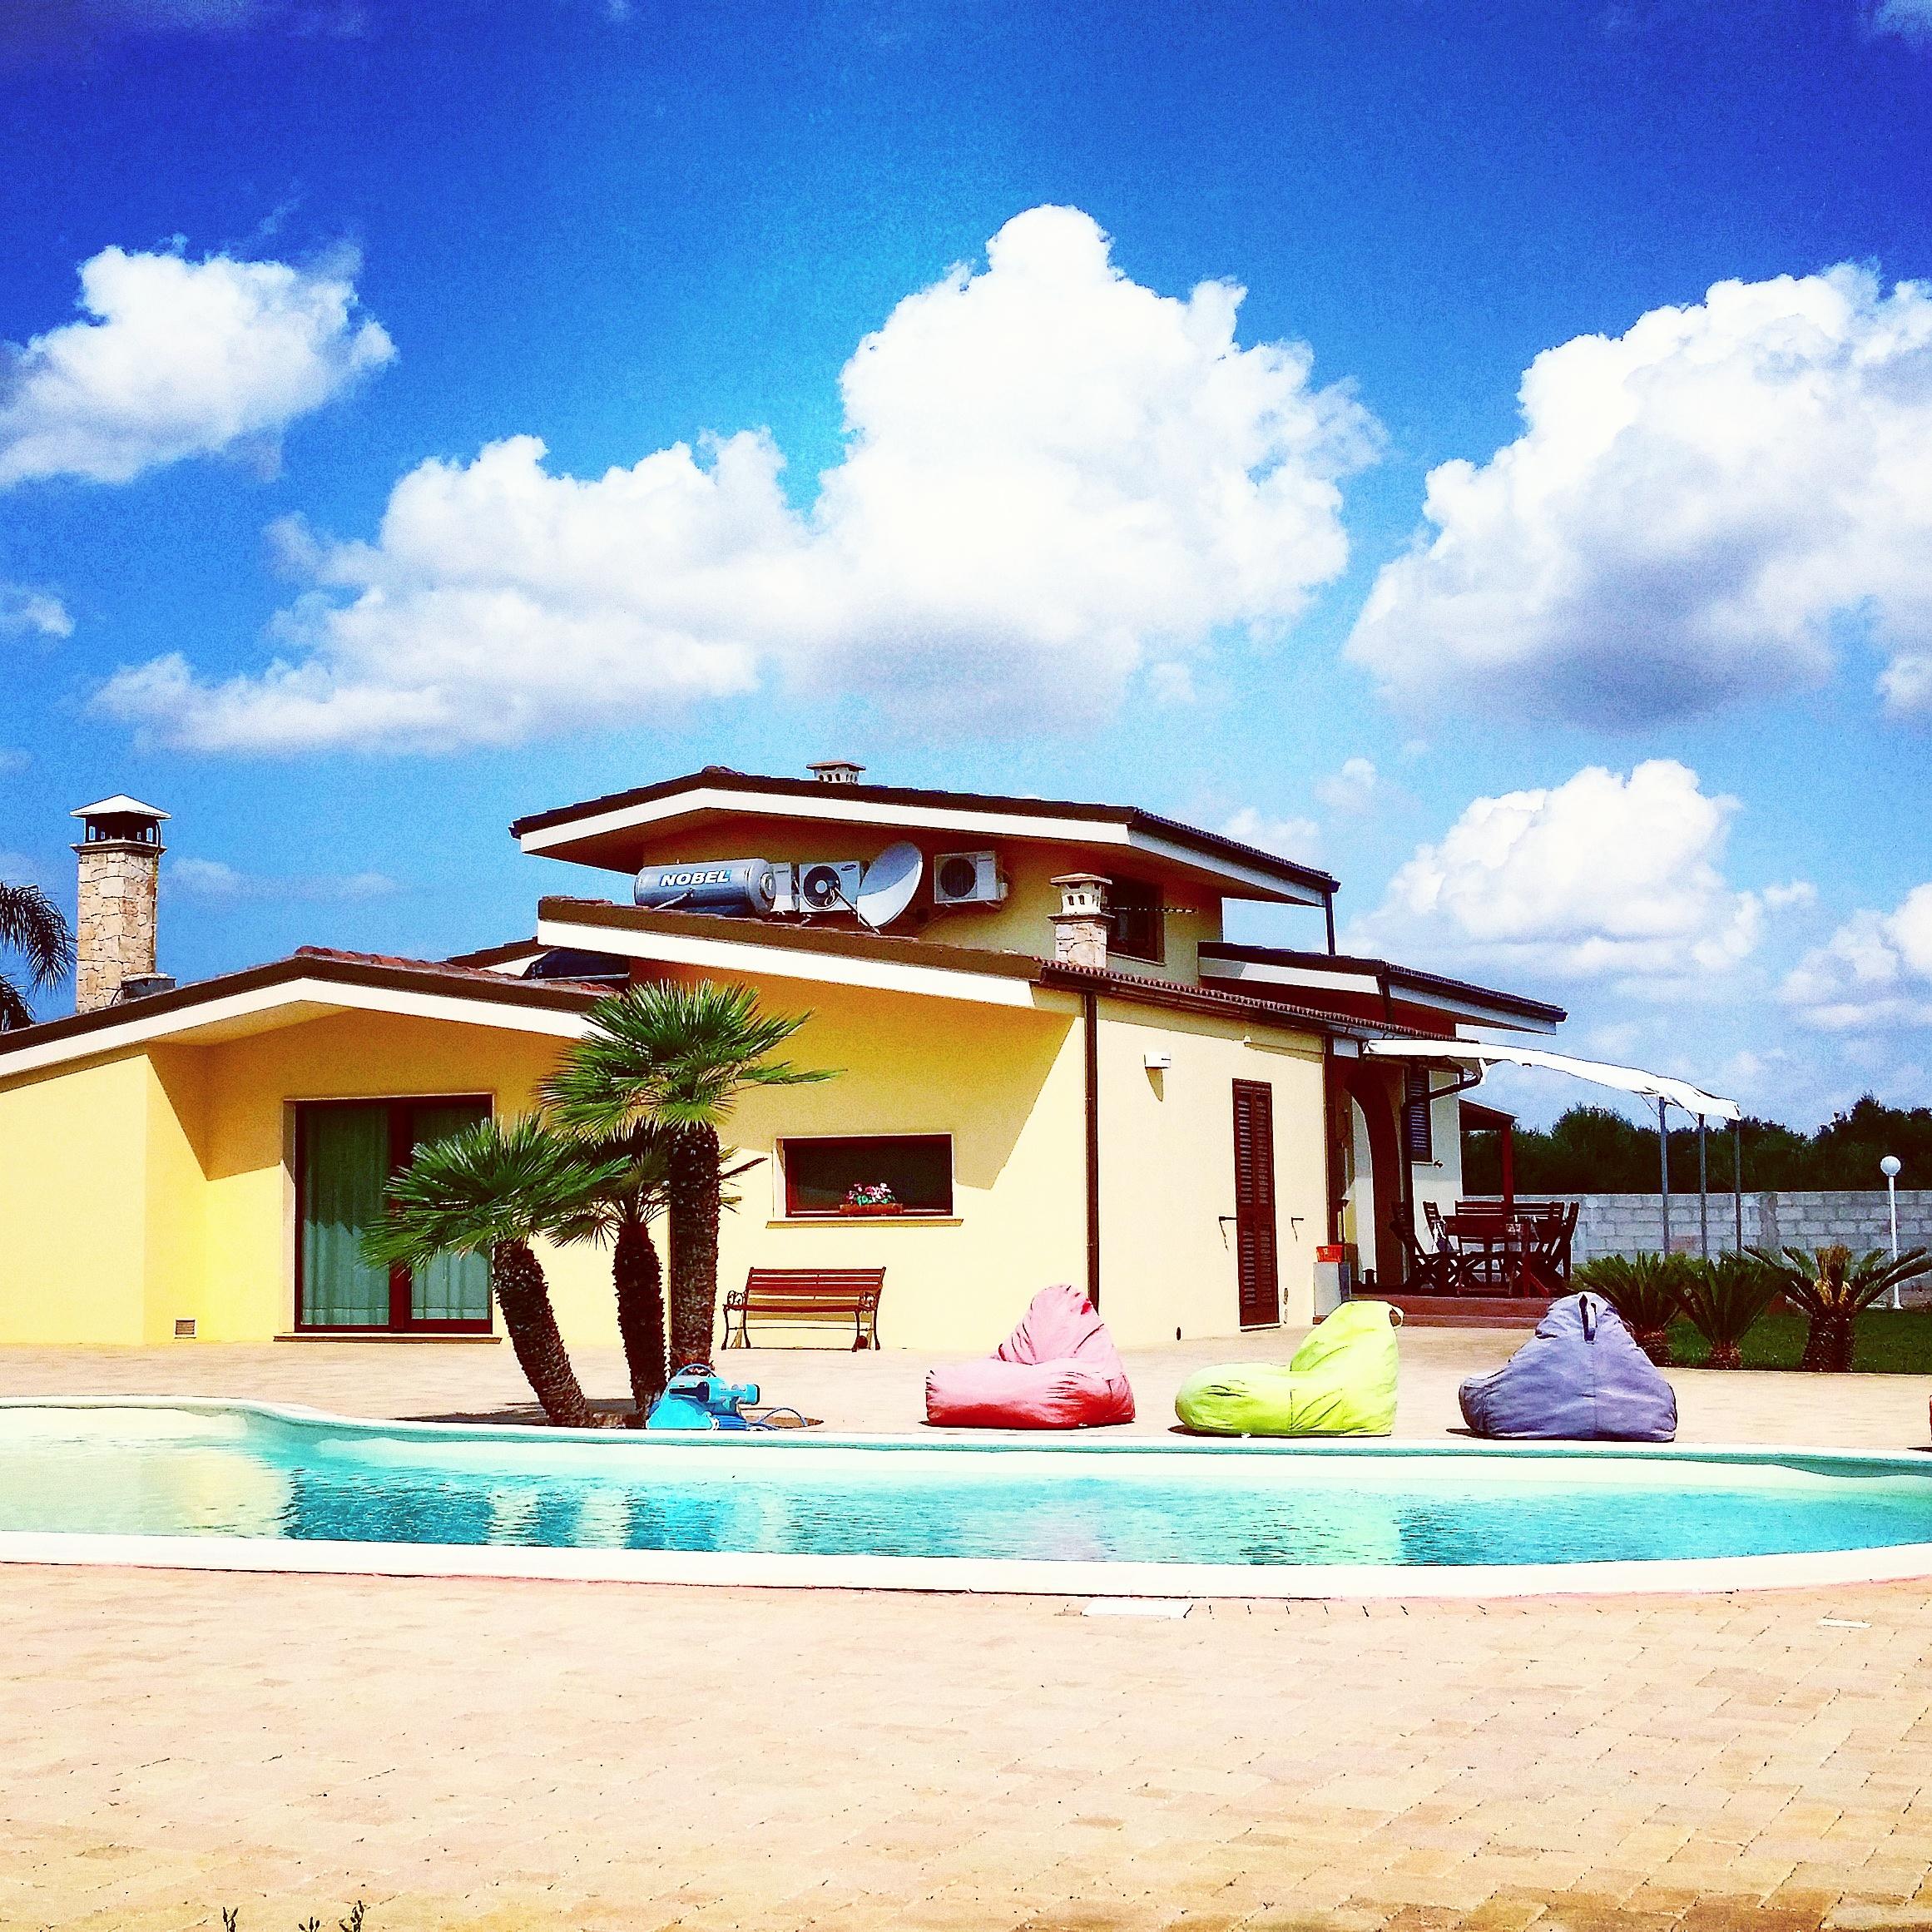 Affittasi location villa nereide con piscina miragu - Villa con piscina ...